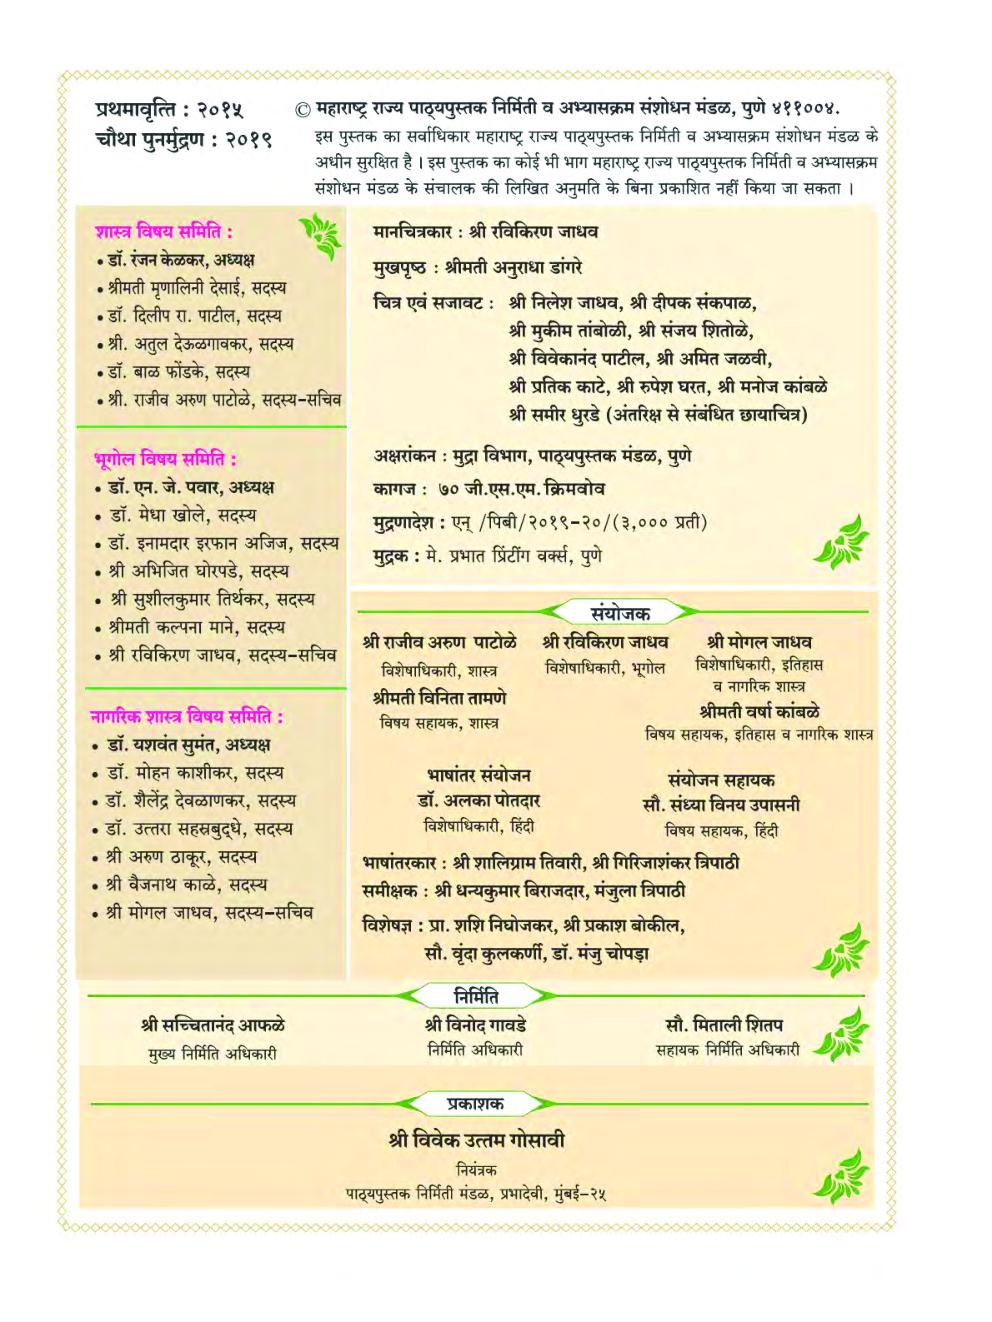 Maharashtra School Textbook परिसर अध्ययन (भाग-१) For Class-5 - Page 3